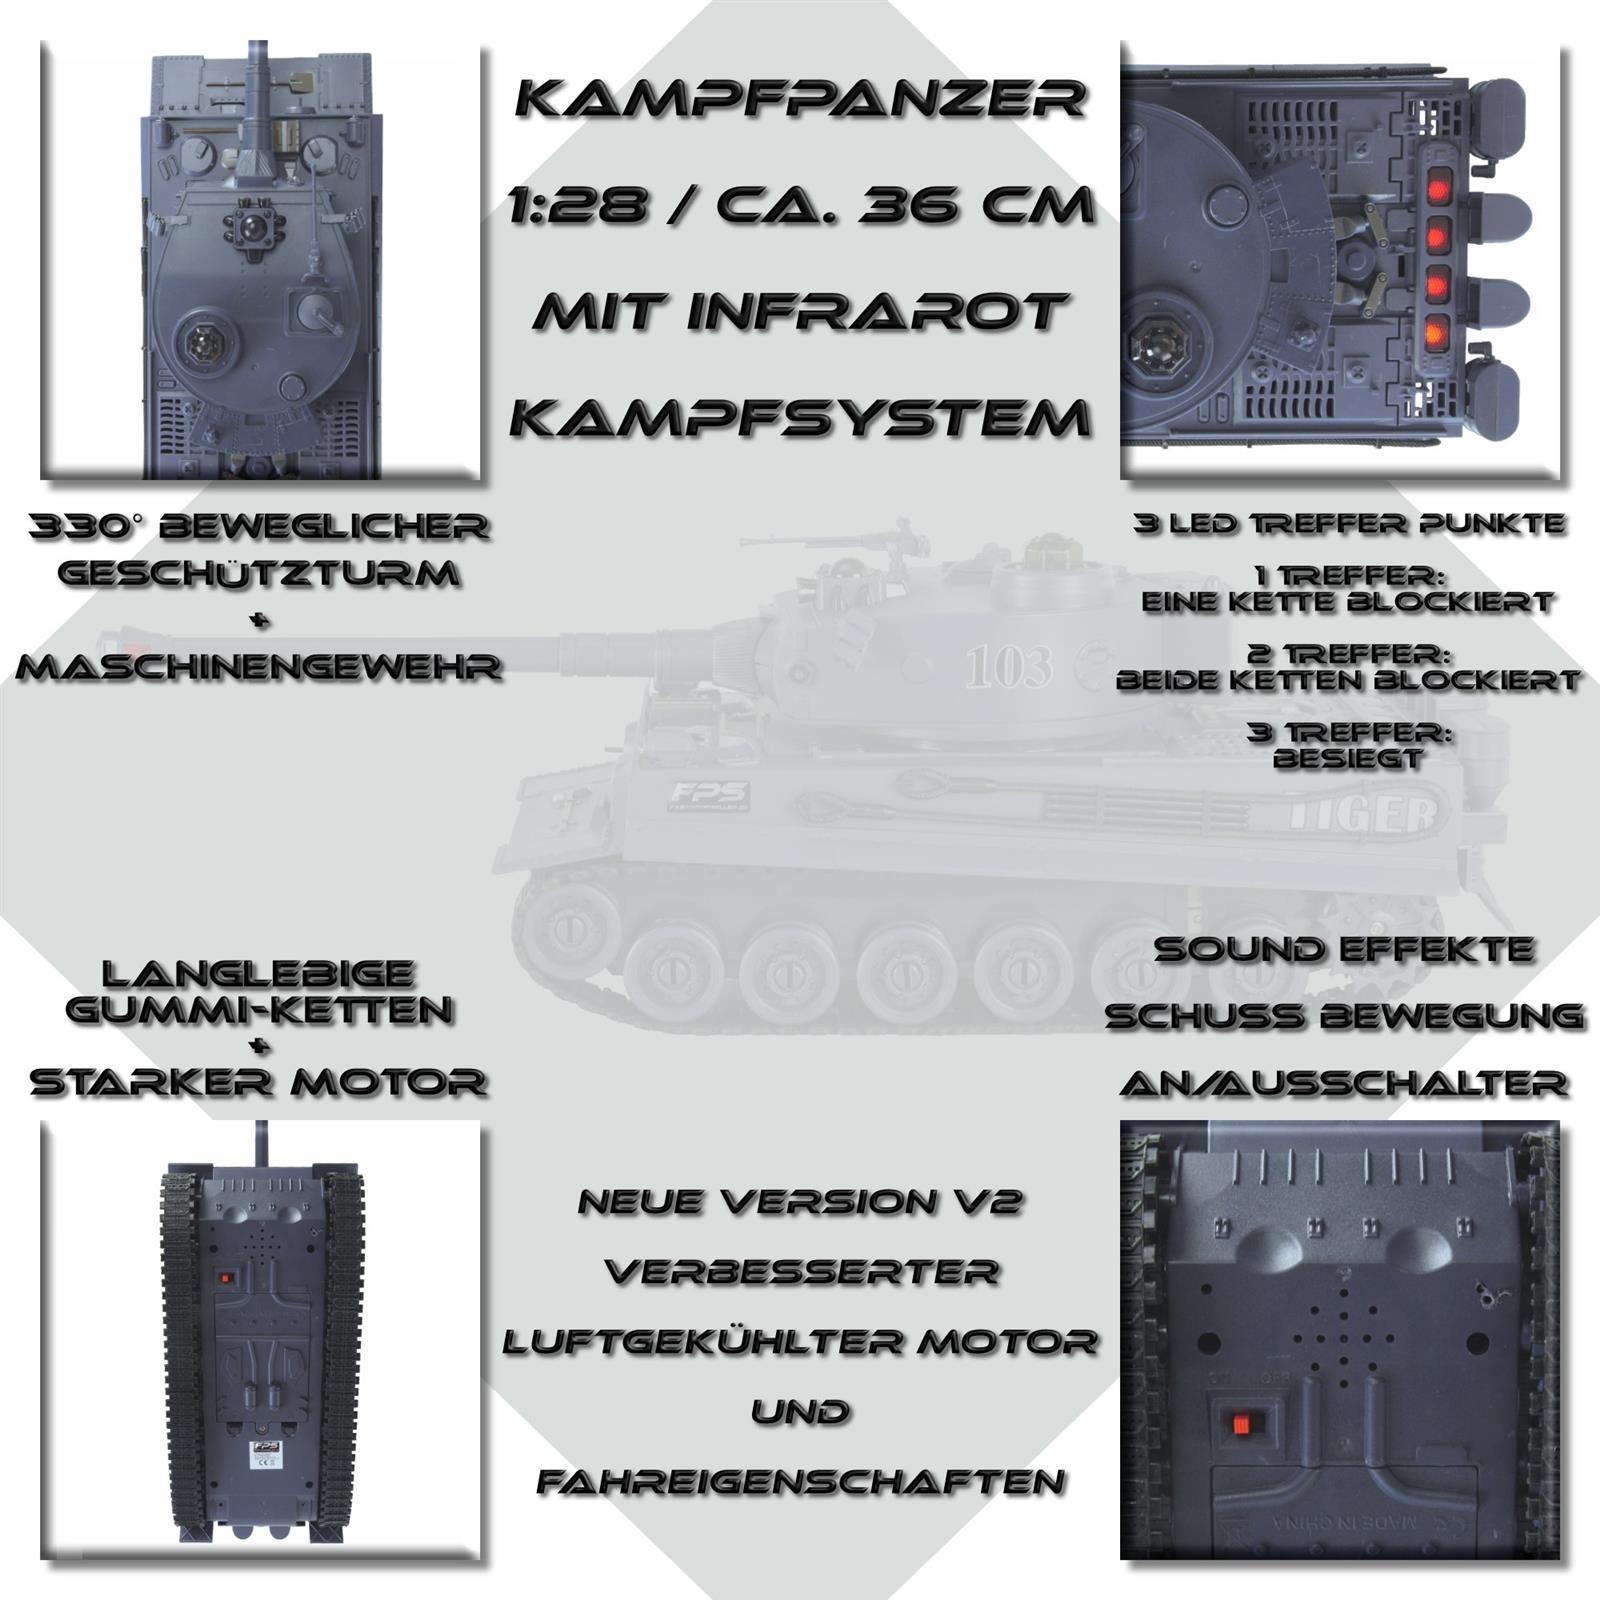 RC Panzer 1:28 Highlights